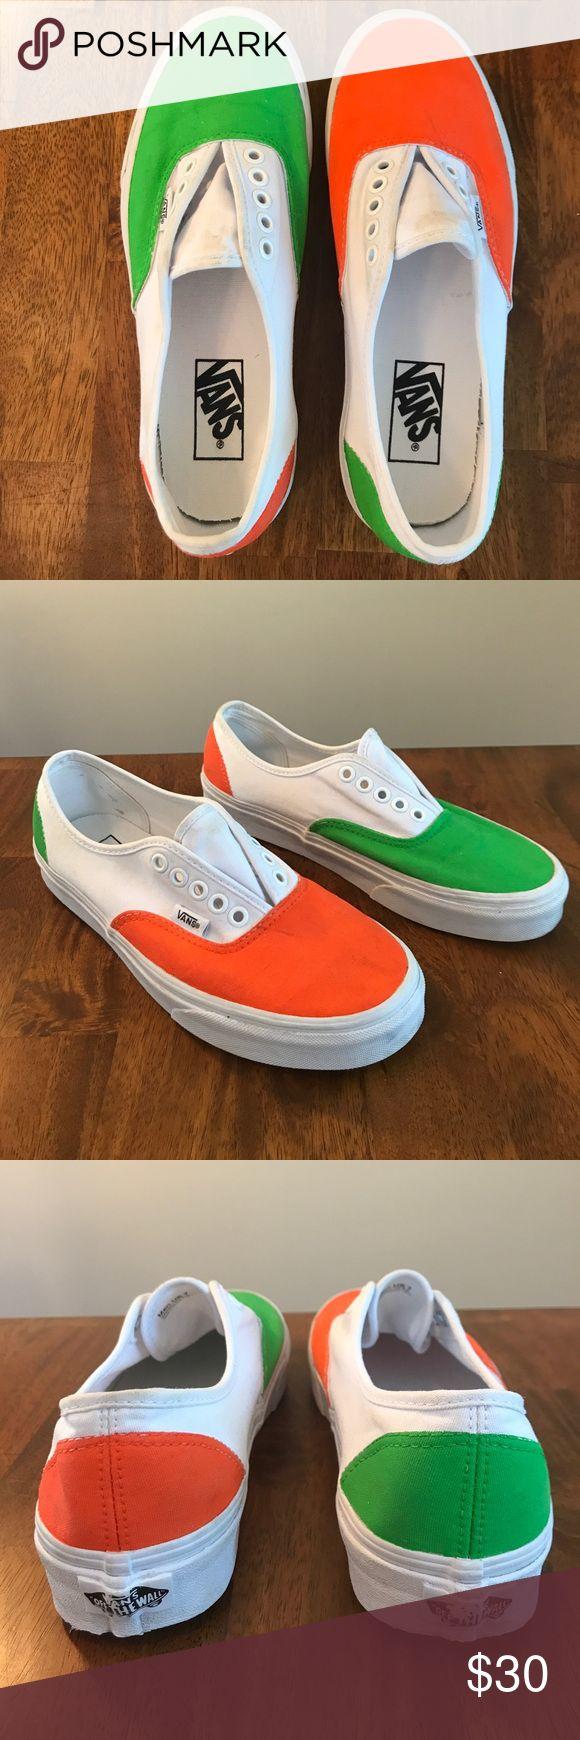 Vans tb4r white orange yellow mens/7 womens/8.5 Need some cleaning, alternating orange/green panels Vans Shoes Sneakers